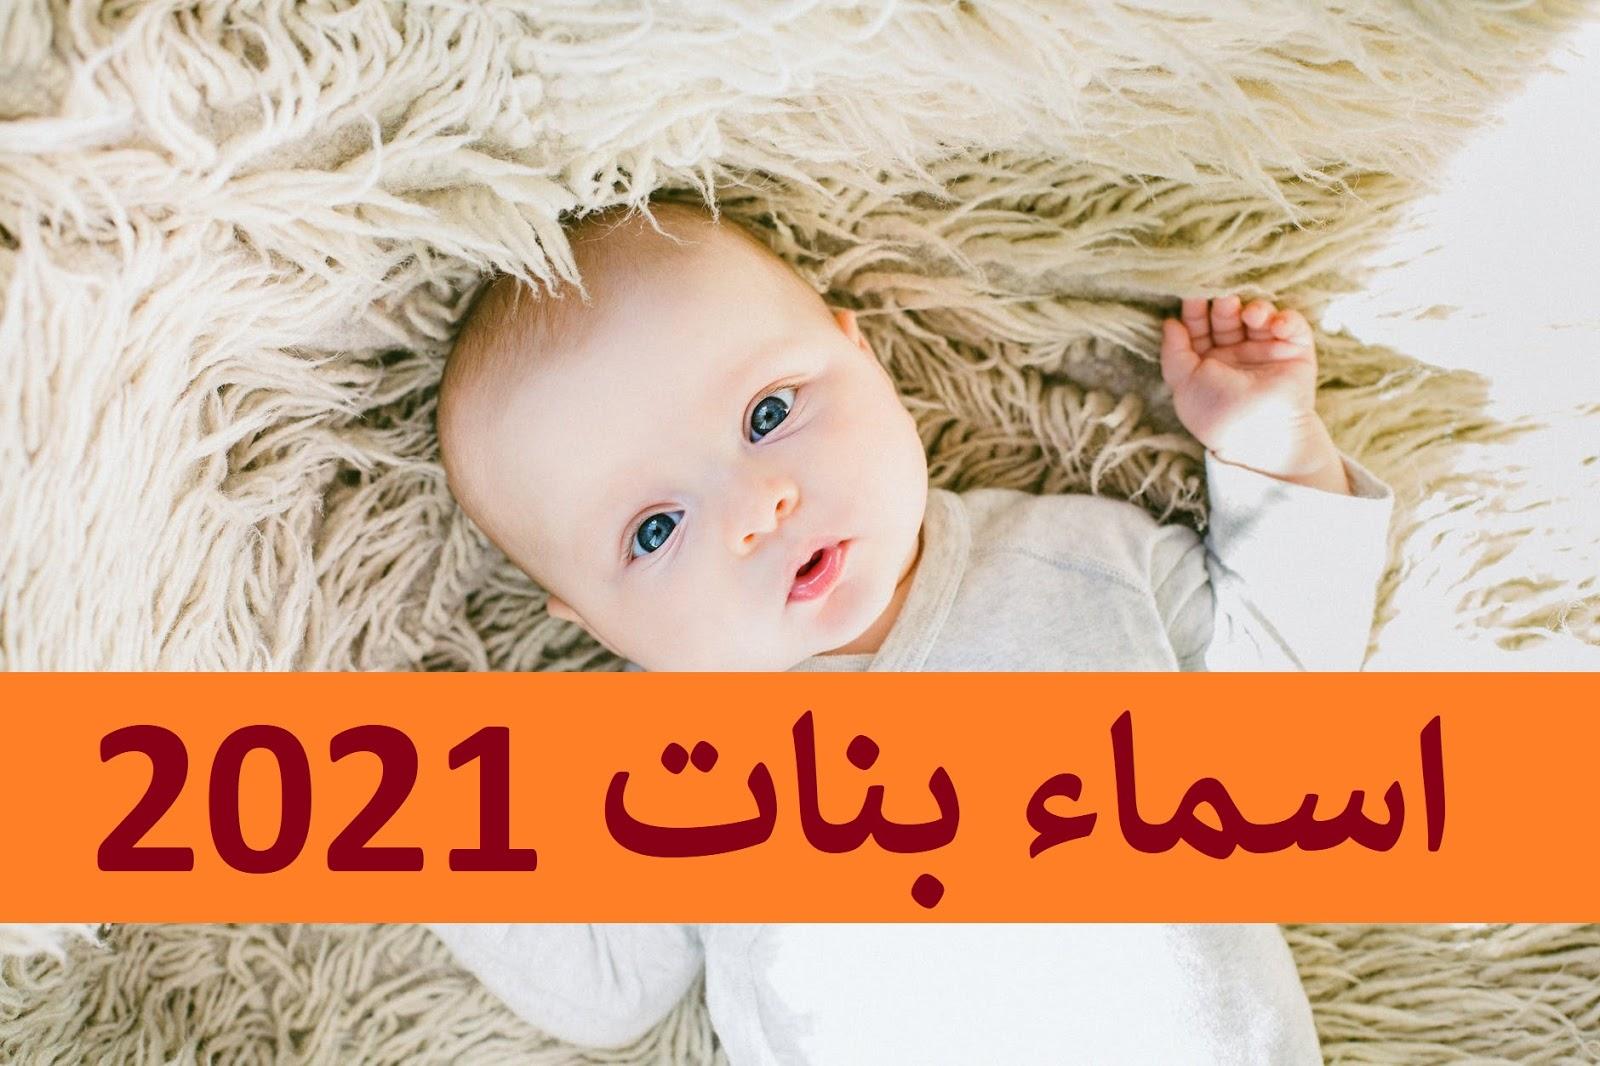 اسماء بنات 2021 جديده